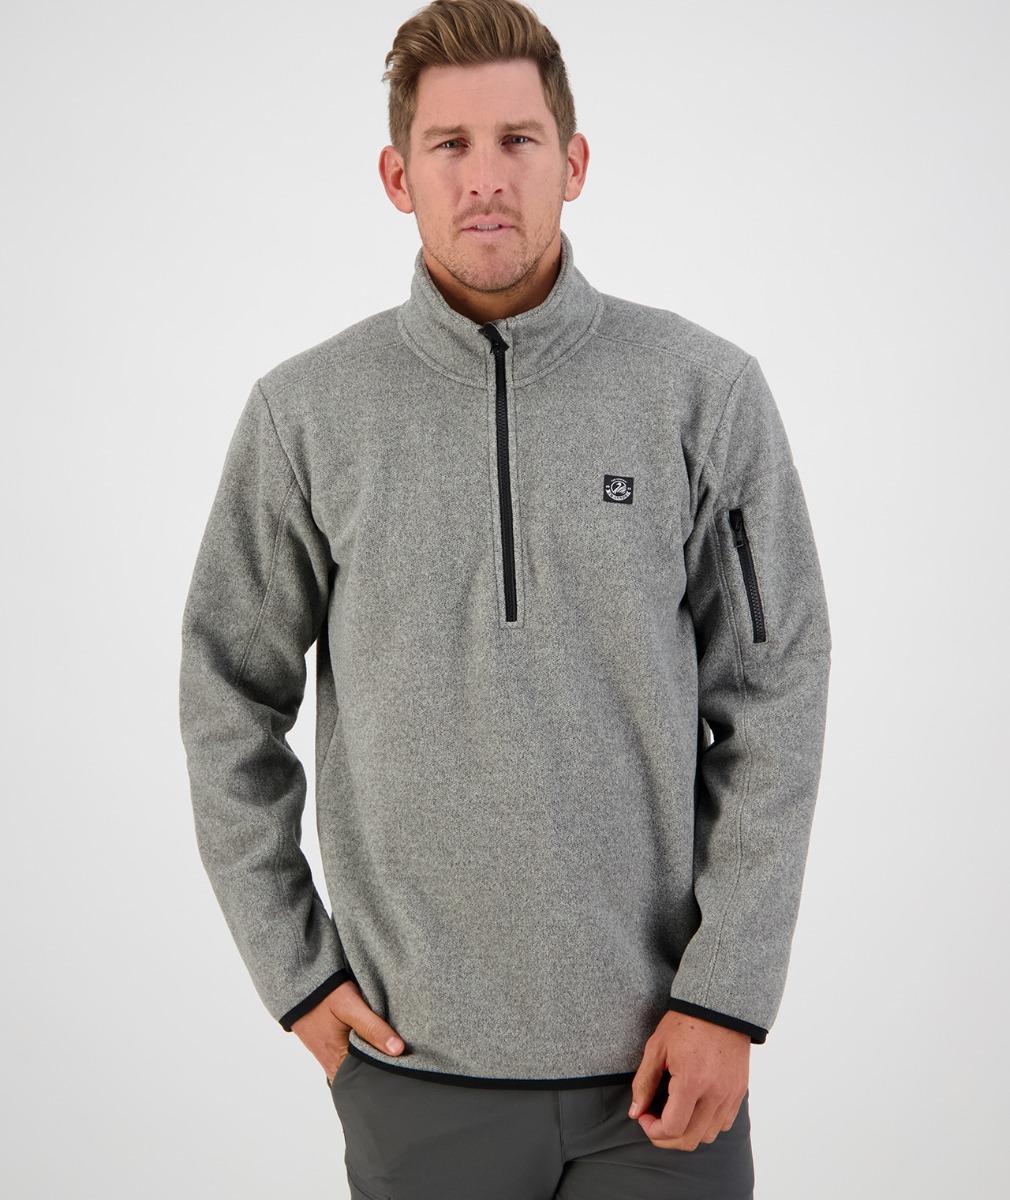 Swanndri Men's Ferrymead Zip Neck Fleece Jumper in Grey